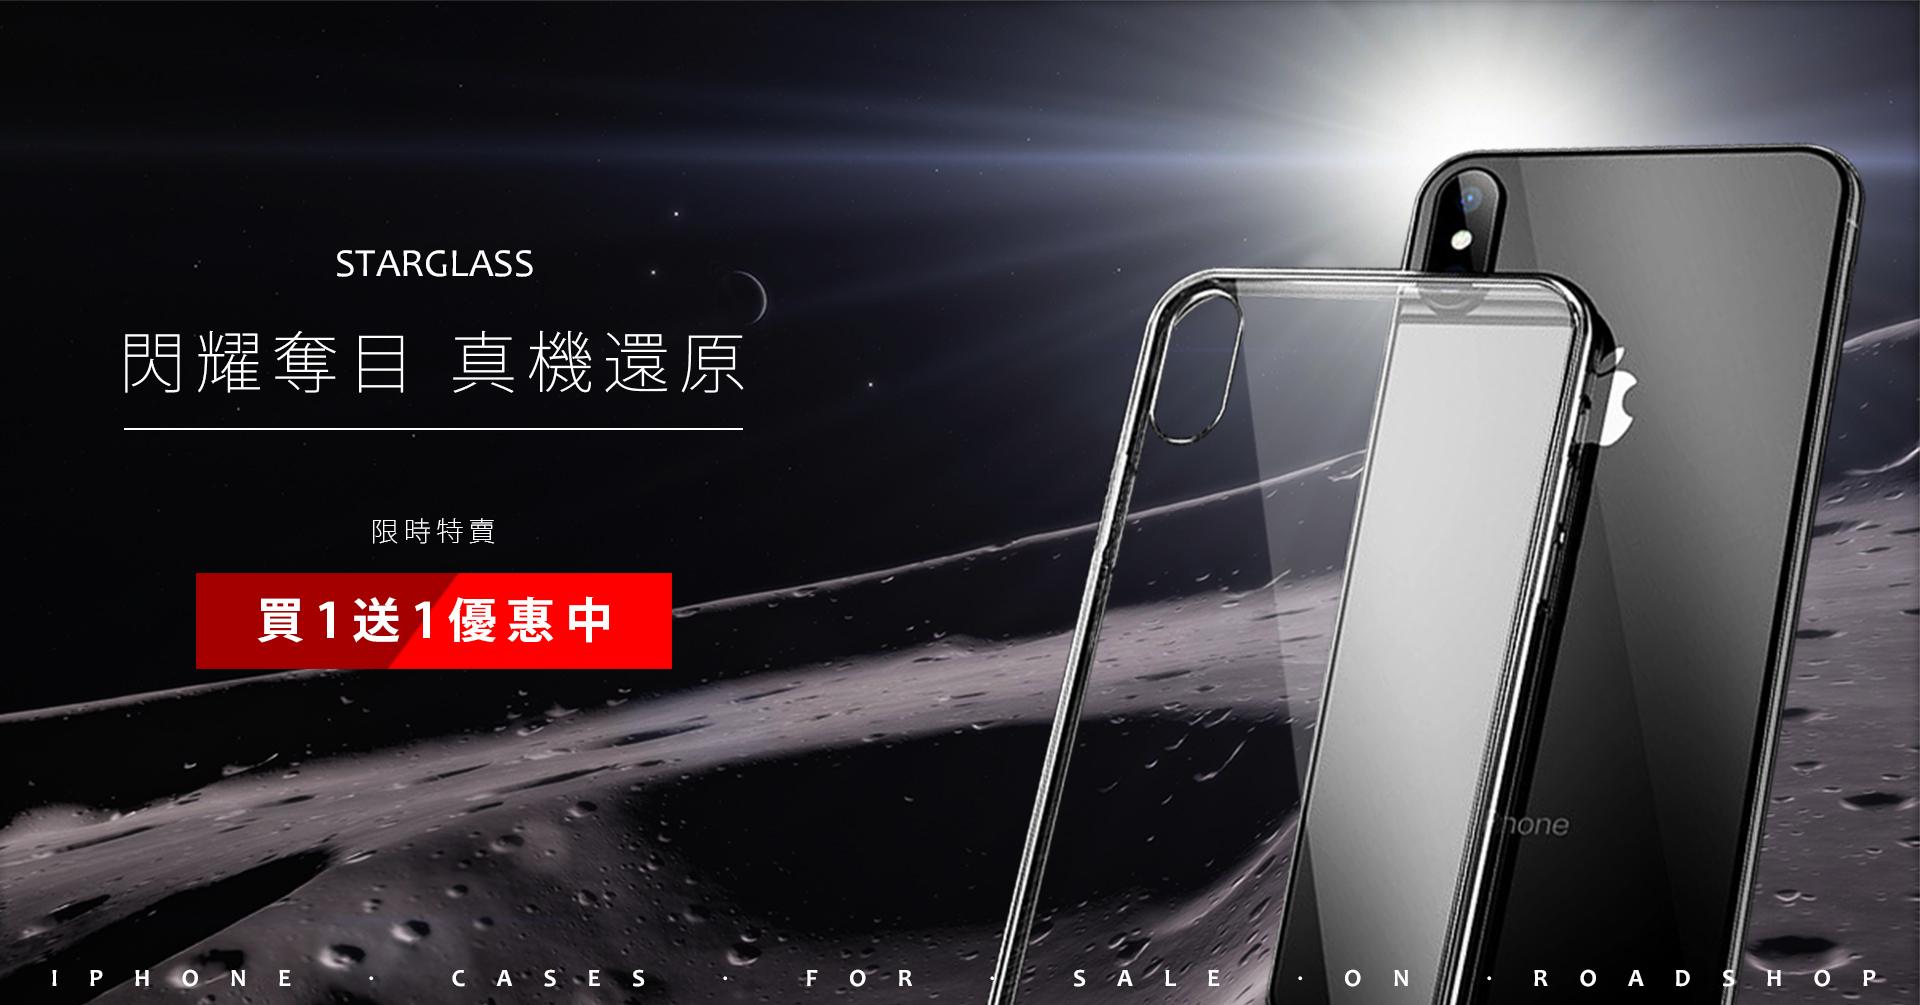 XsMax手機殼,XR手機殼,Xs手機殼8plus/7plus手機殼